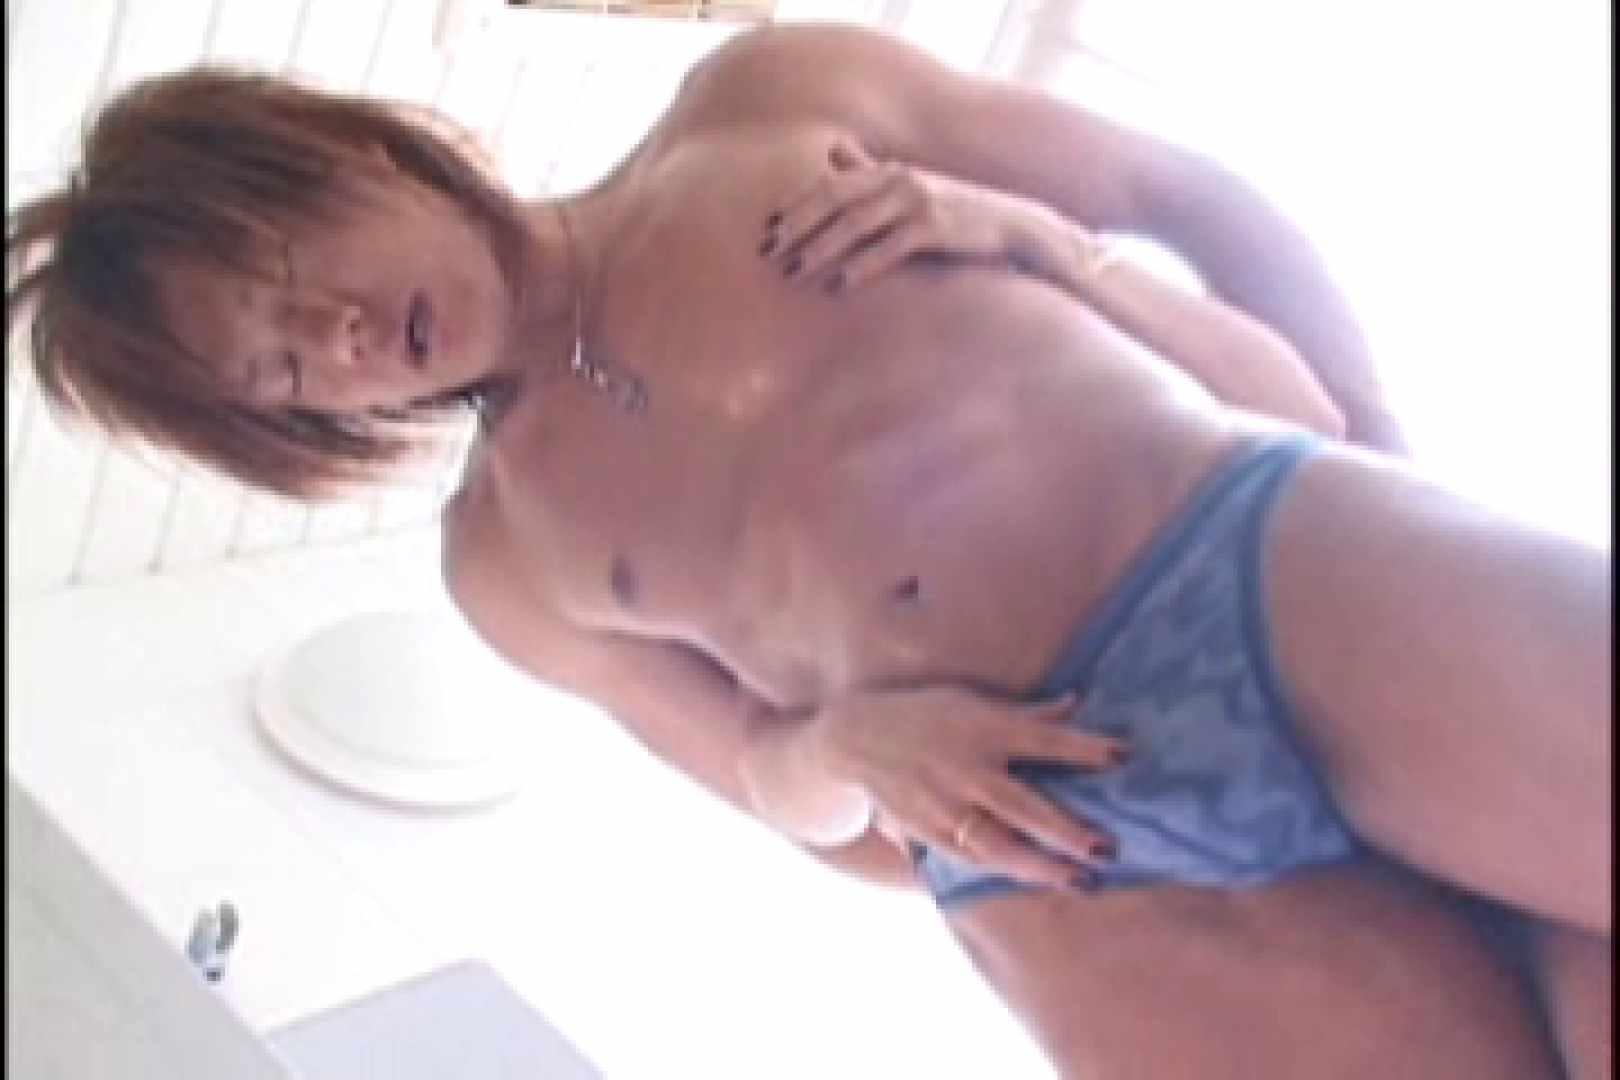 BEST OF イケメン!!男目線のガチSEX vol.01(対女性作品) 腰使い 男同士動画 63枚 29